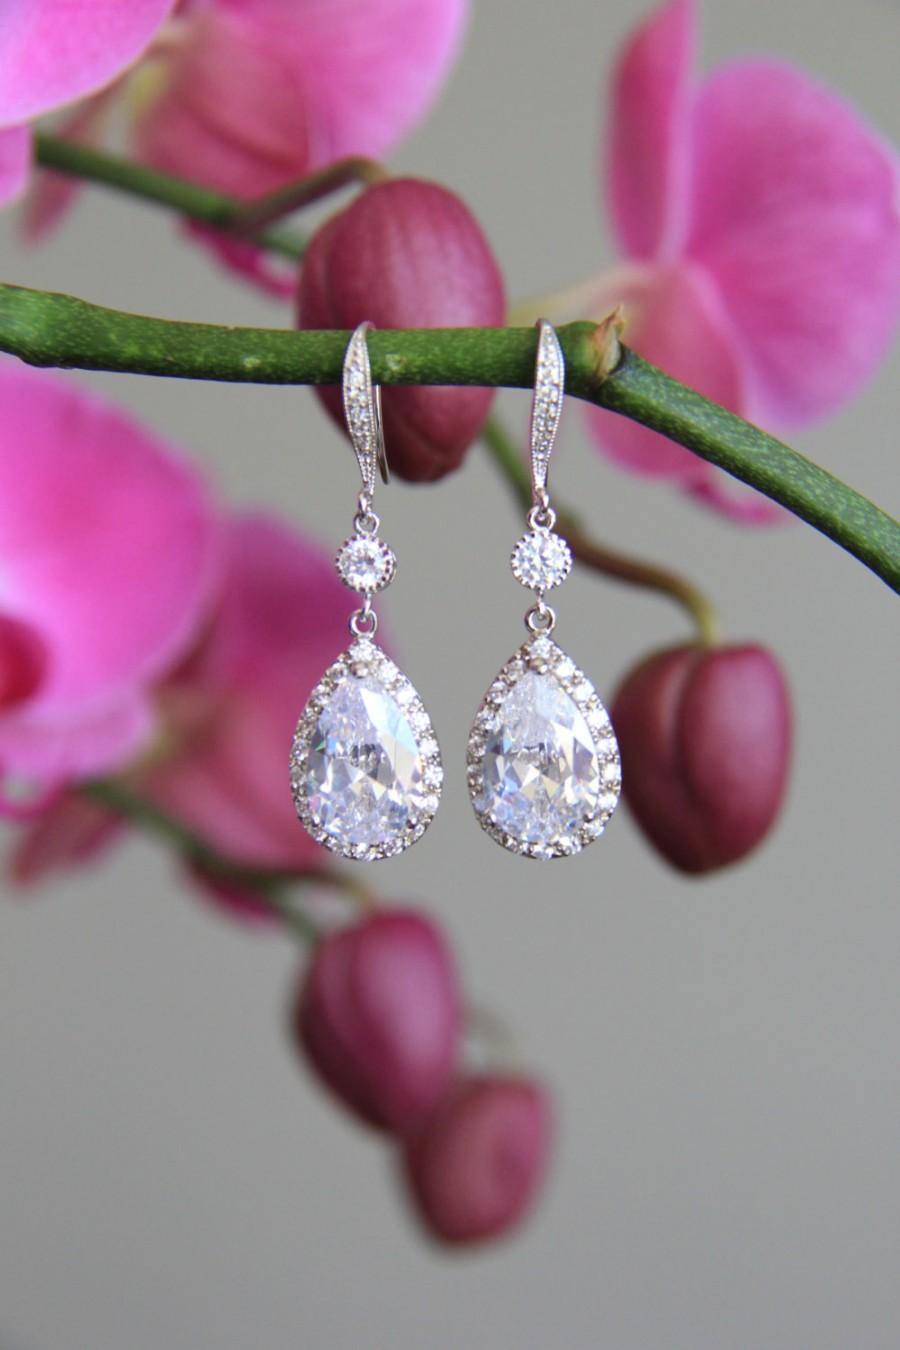 Свадьба - Sparkle filled cz earrings, cubic zirconia earrings, wedding jewelry, bridal jewelry, wedding earrings, bridal earrings